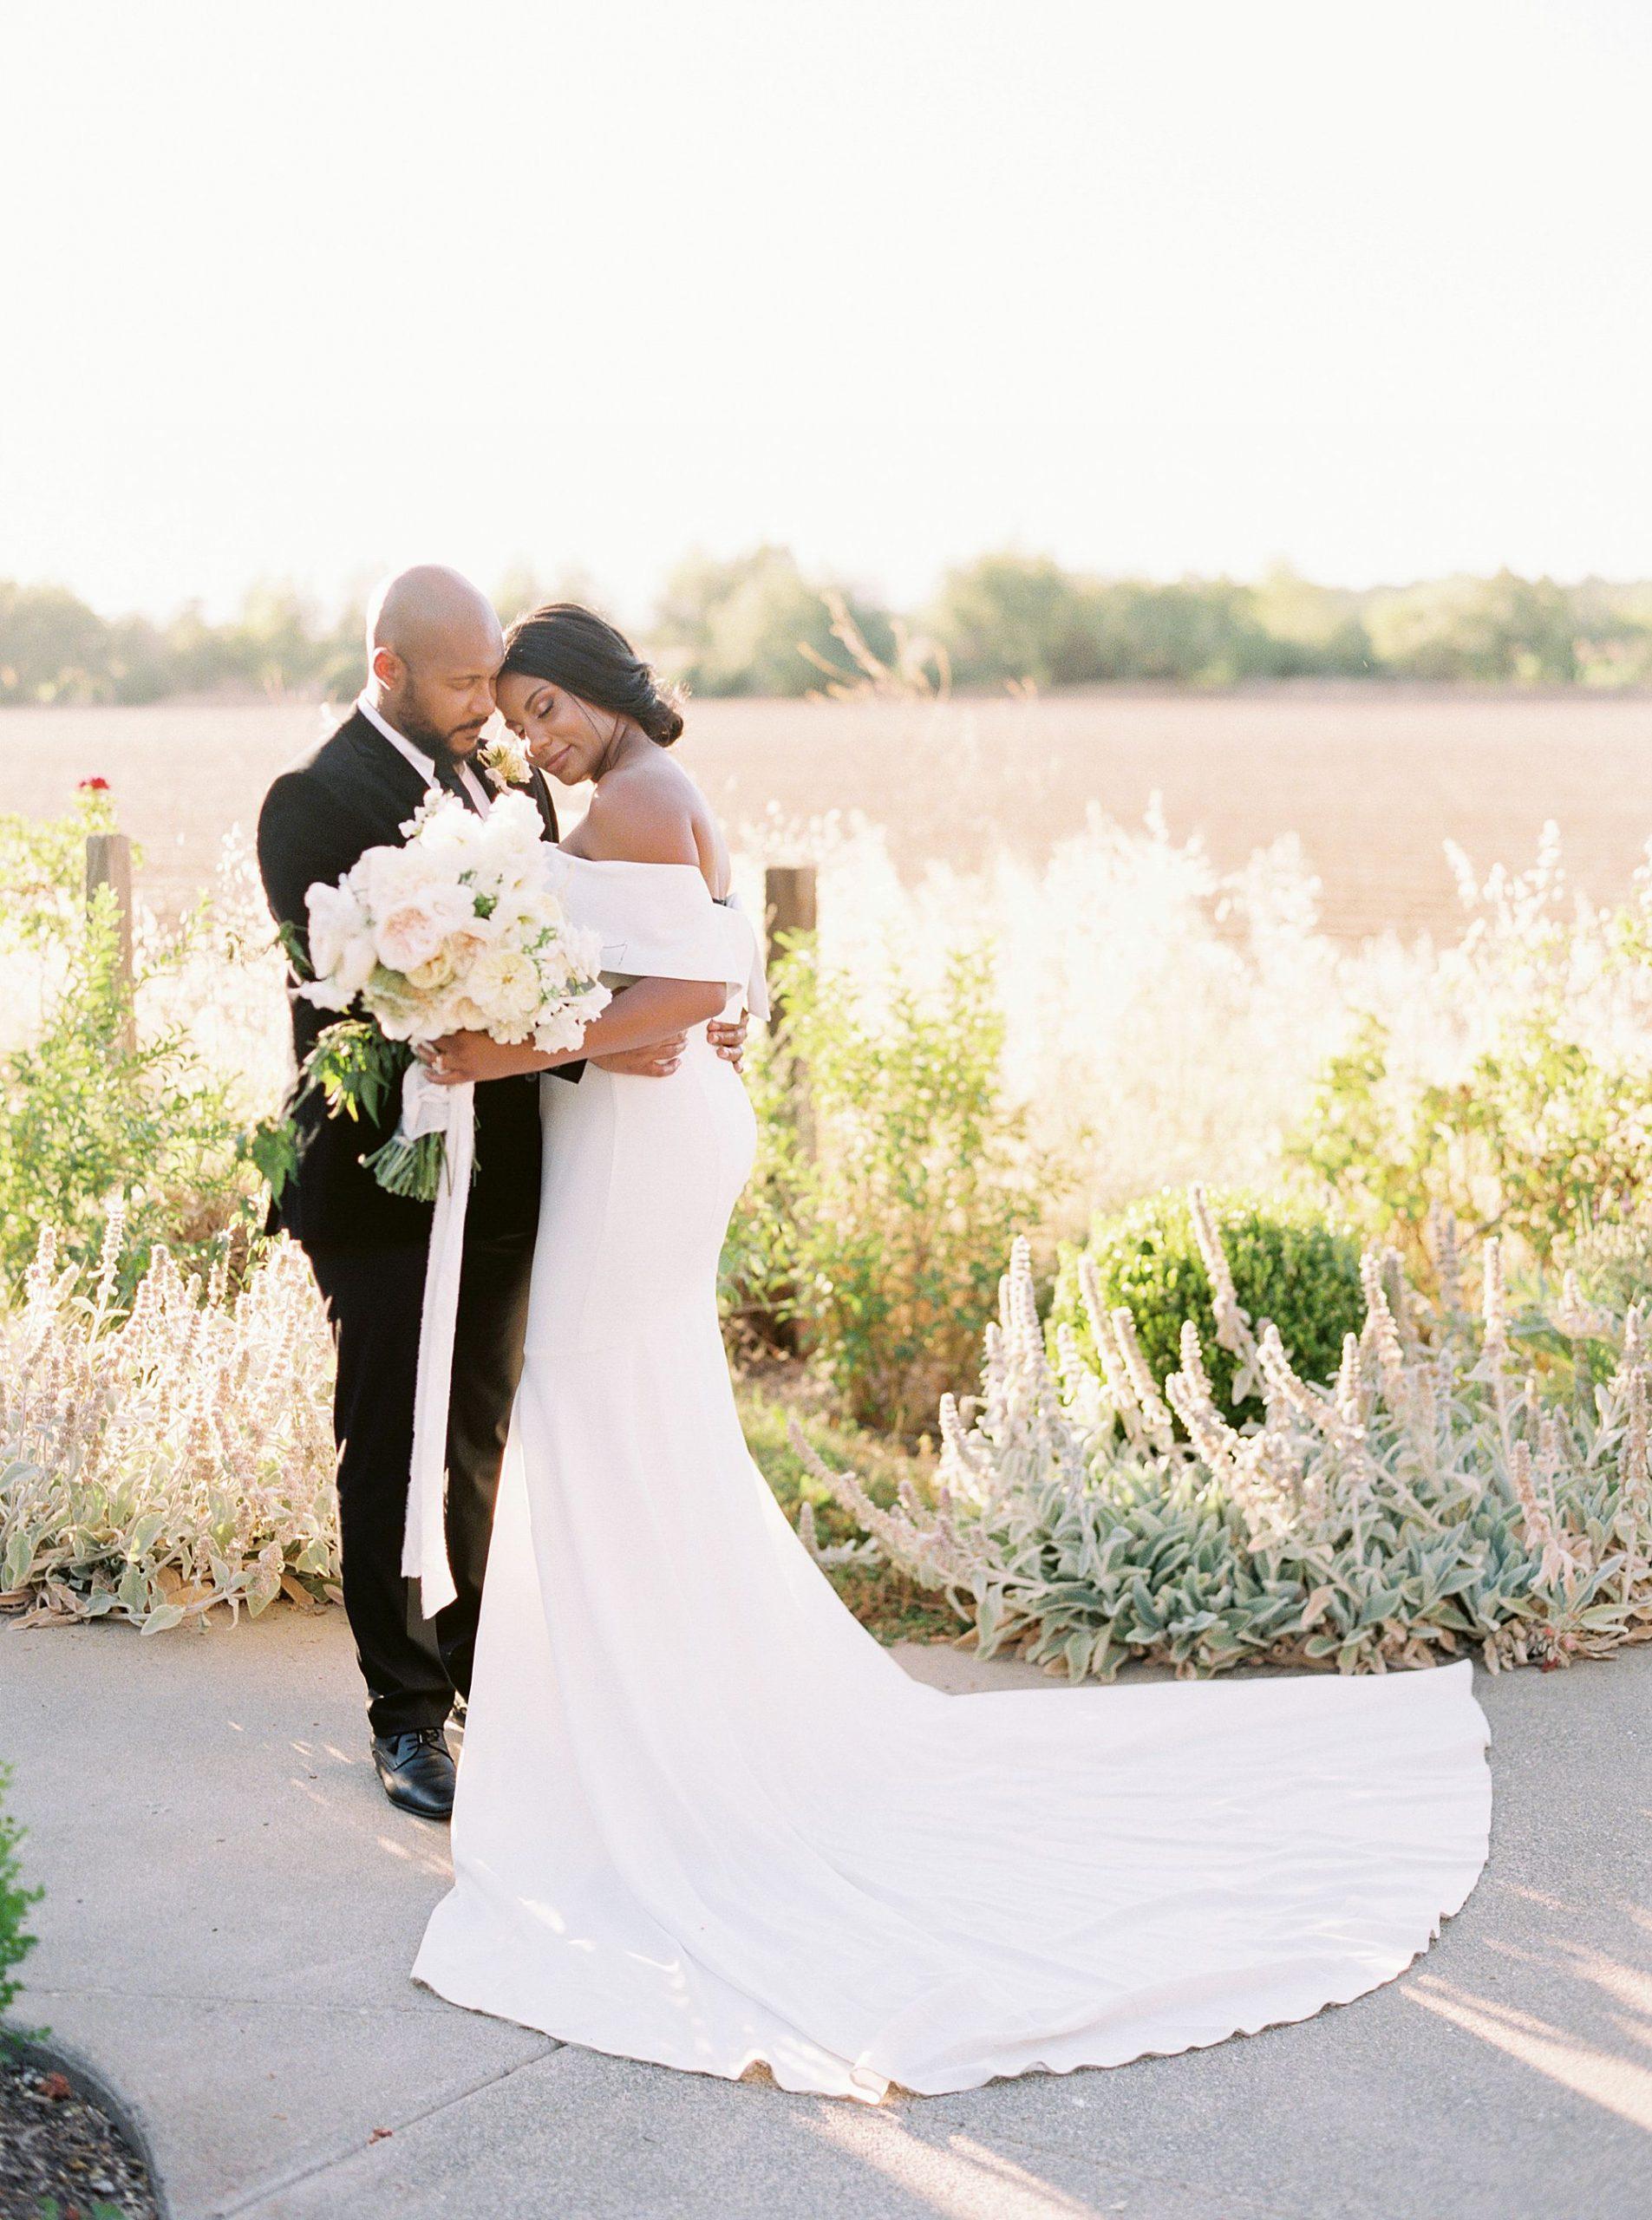 Park Winters Micro-Wedding Inspiration on Style Me Pretty - Stephanie Teague Events - Ashley Baumgartner - Park Winters Wedding - Black Tie Wedding - Micro-Wedding Sacramento Photographer_0042.jpg